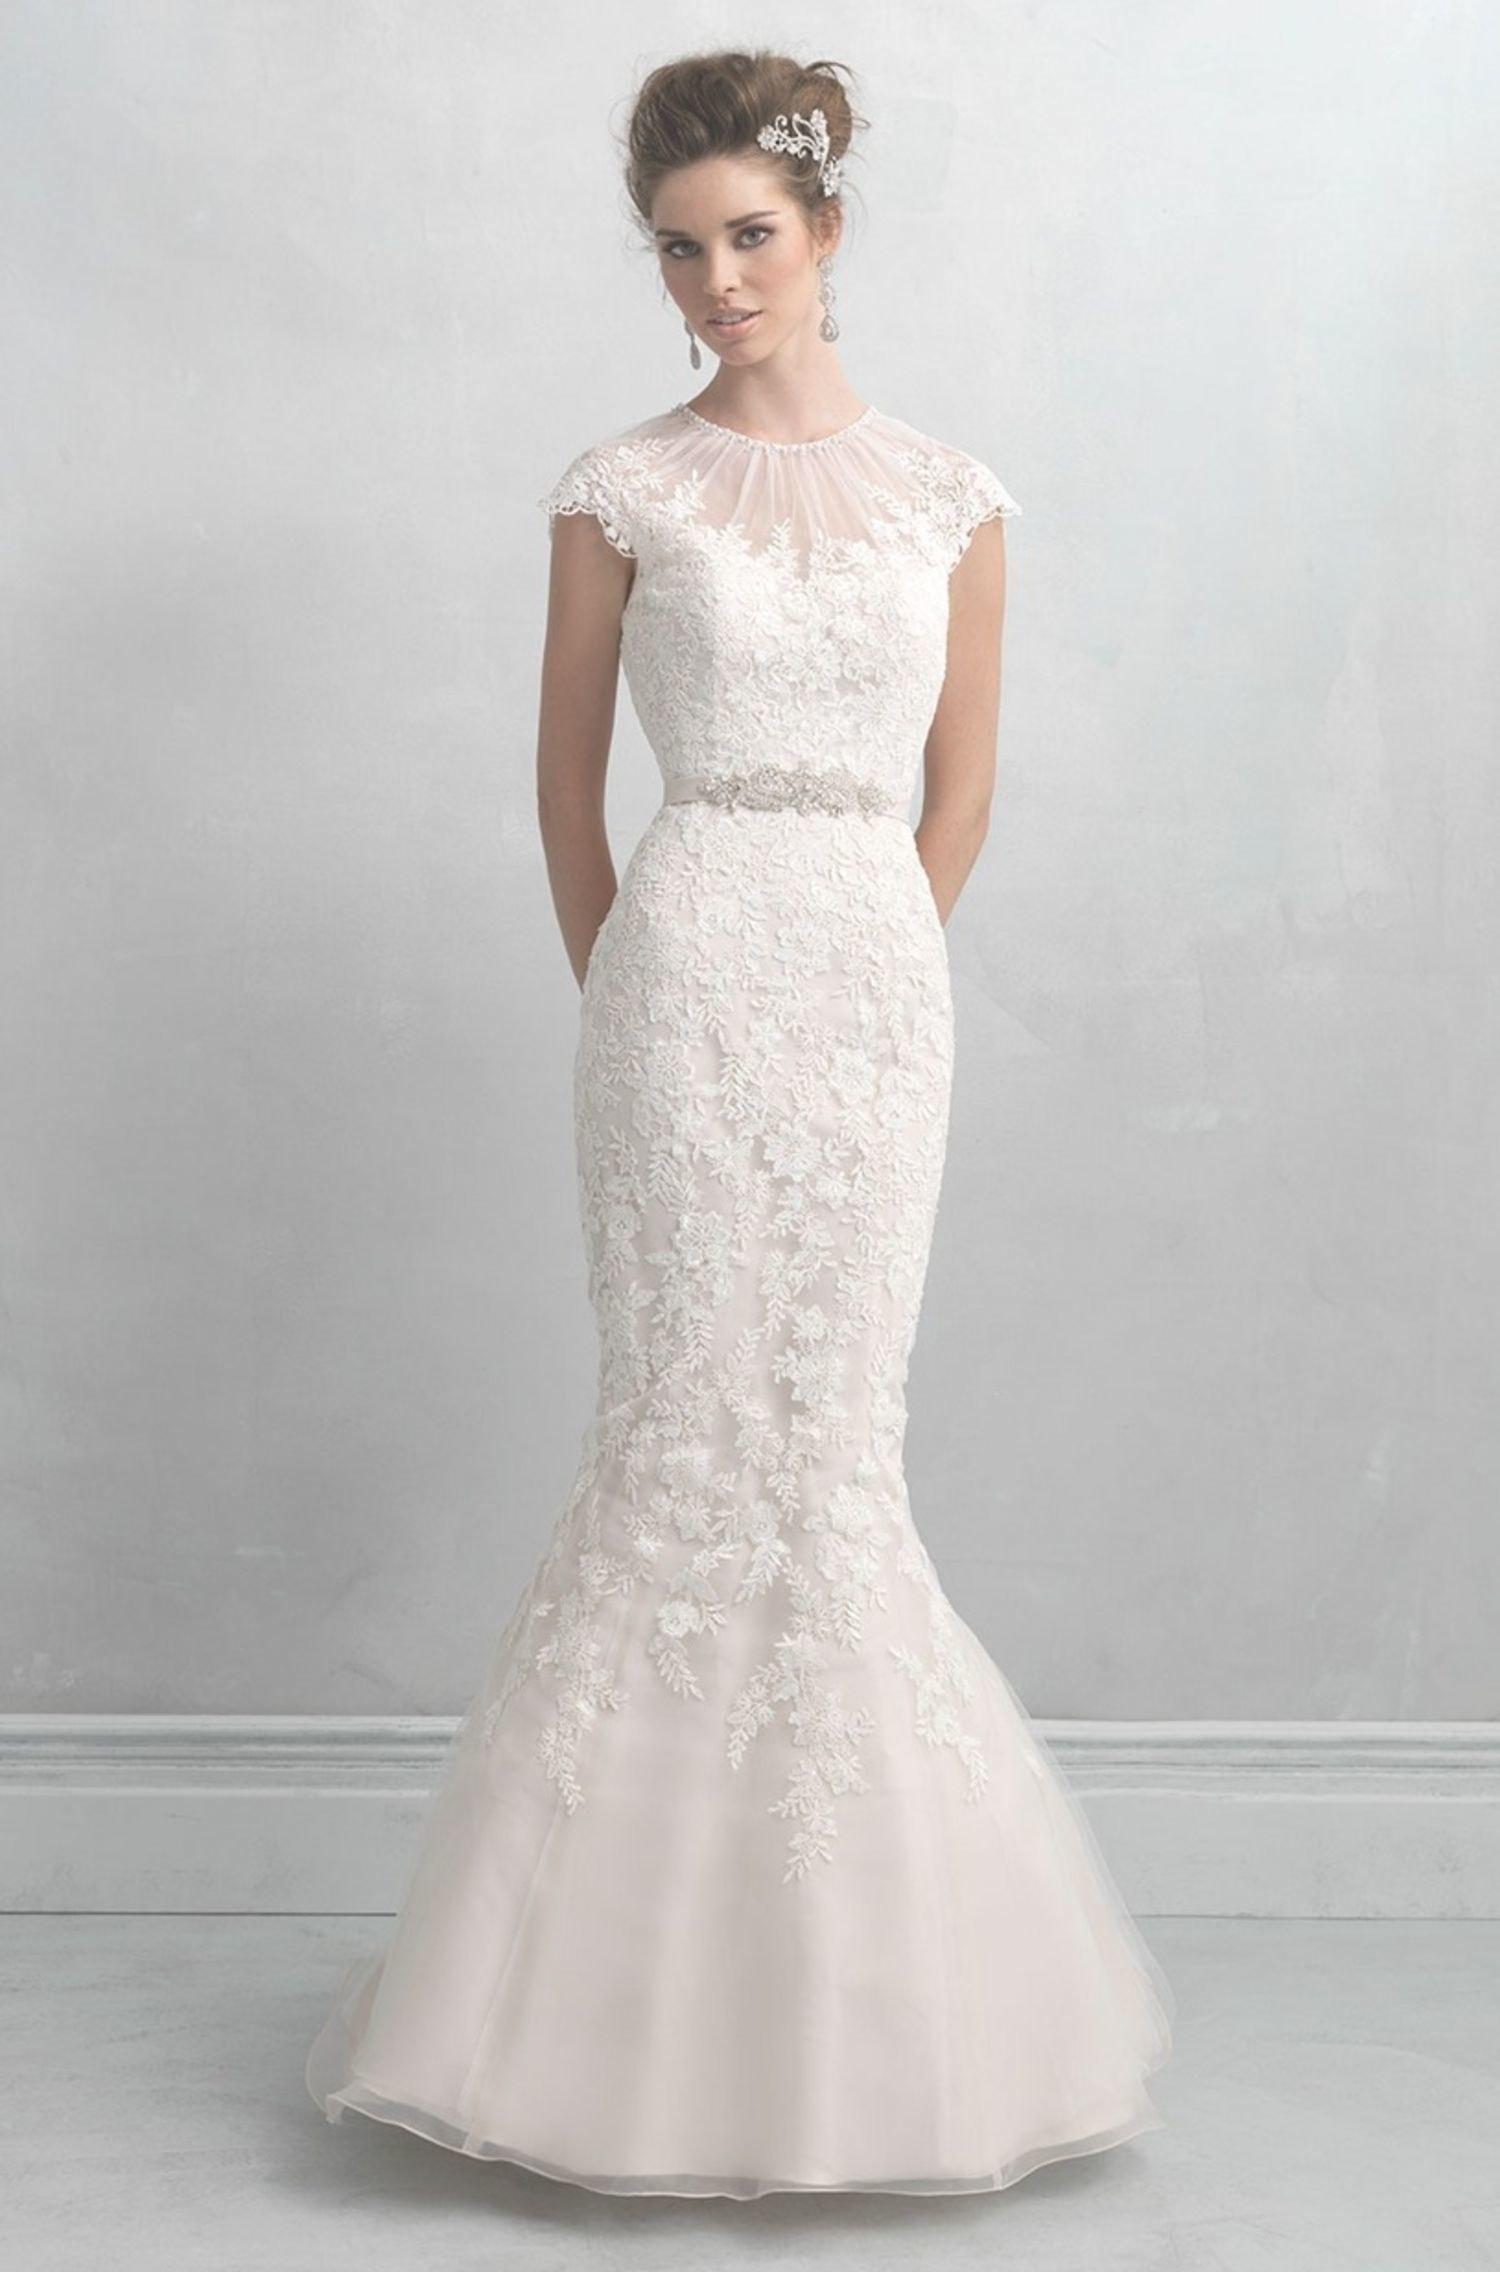 illusion wedding dresses photo - 1